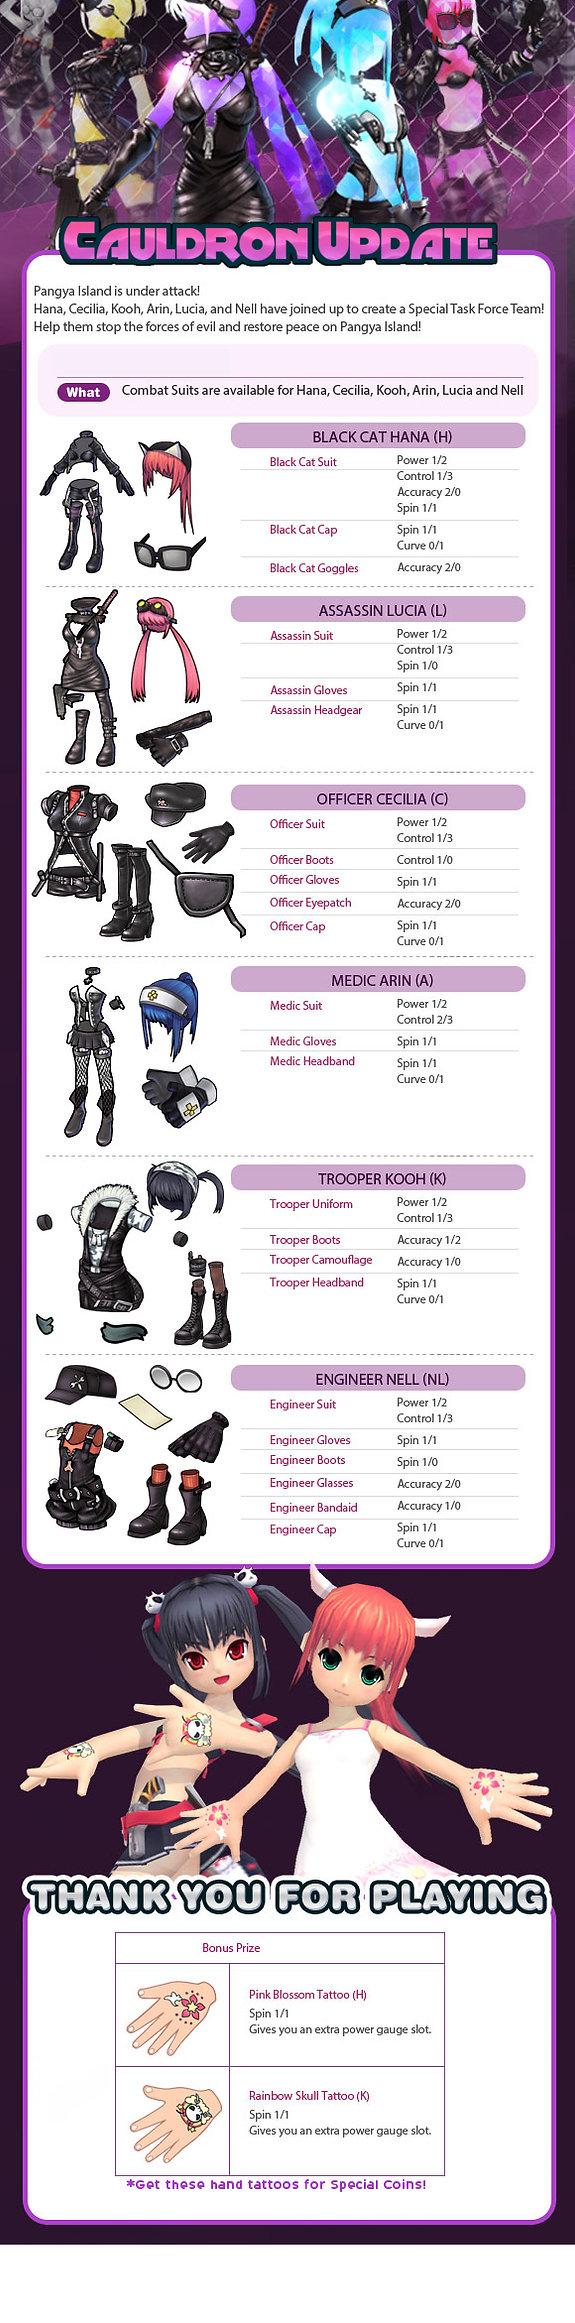 [Pangya CB - Caldero] Combat Suits + Hand Tattoos [Finalizado] Acf295_b9ca42f37115464f86cb3e746fde9e81~mv2